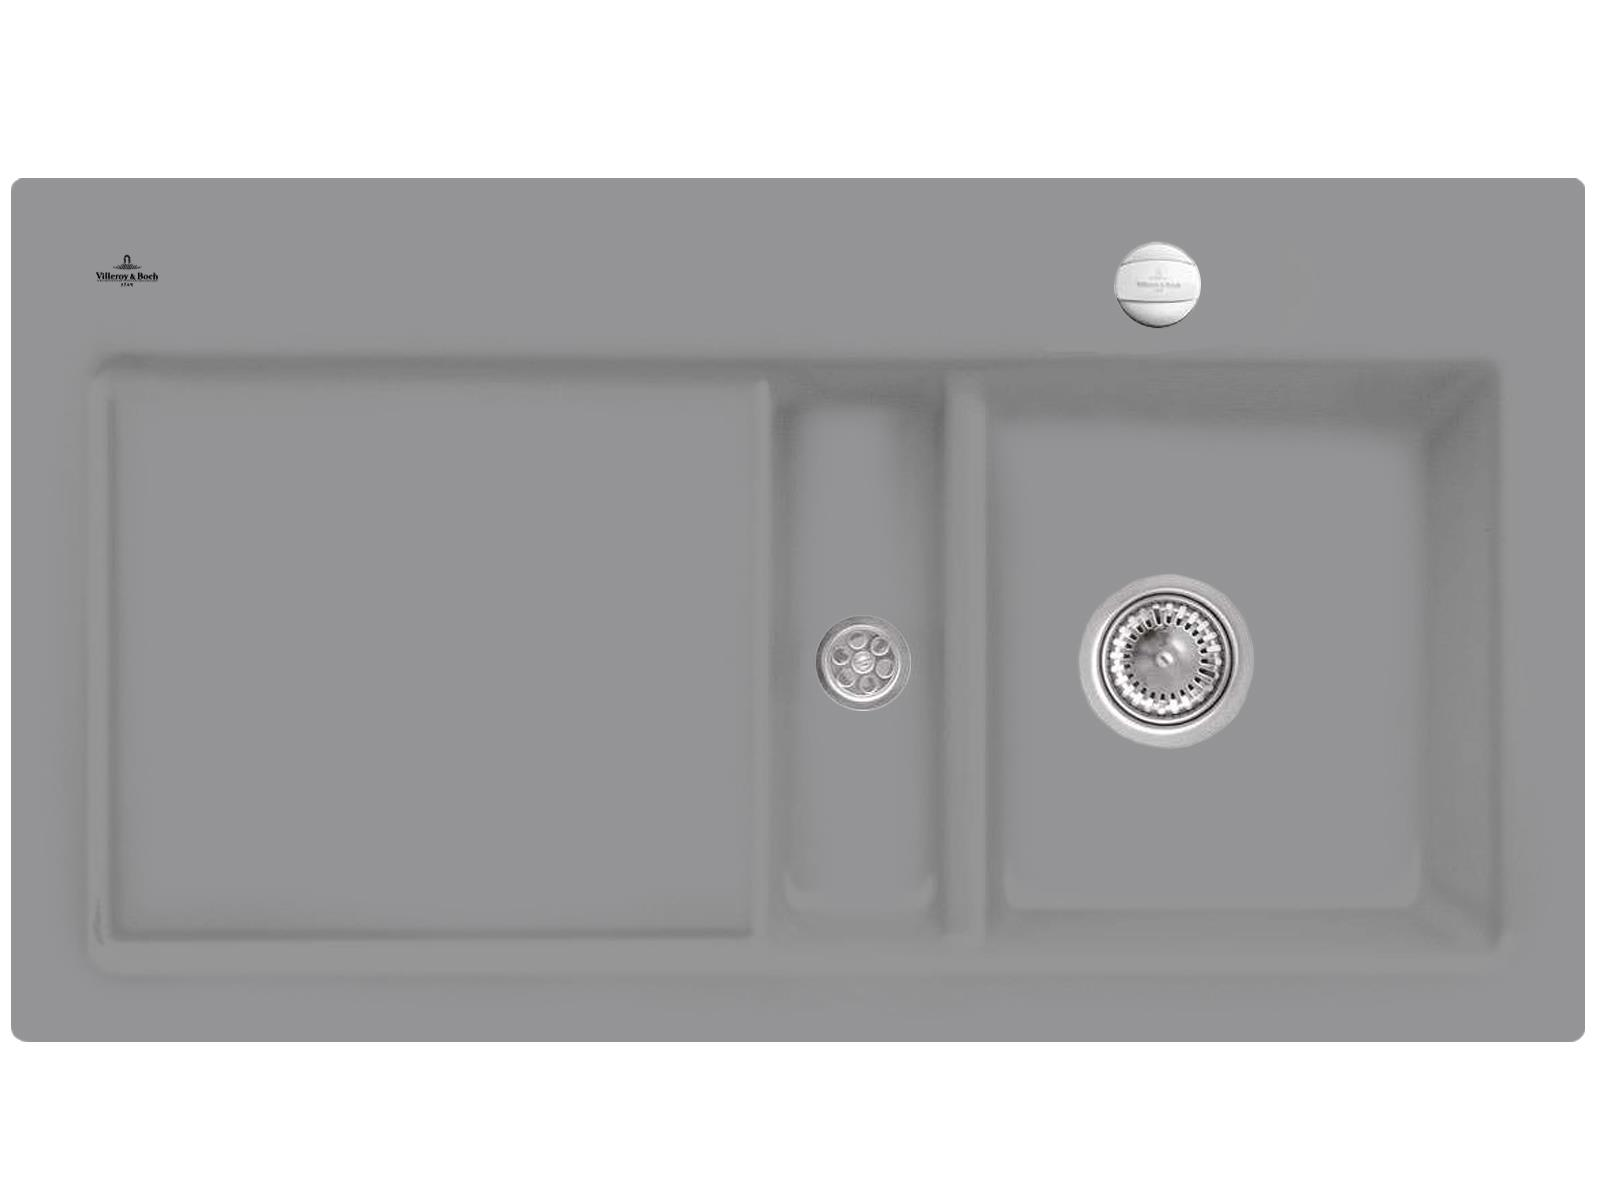 Villeroy & Boch Subway 50 Stone - 6713 02 SL Keramikspüle Exzenterbetätigung